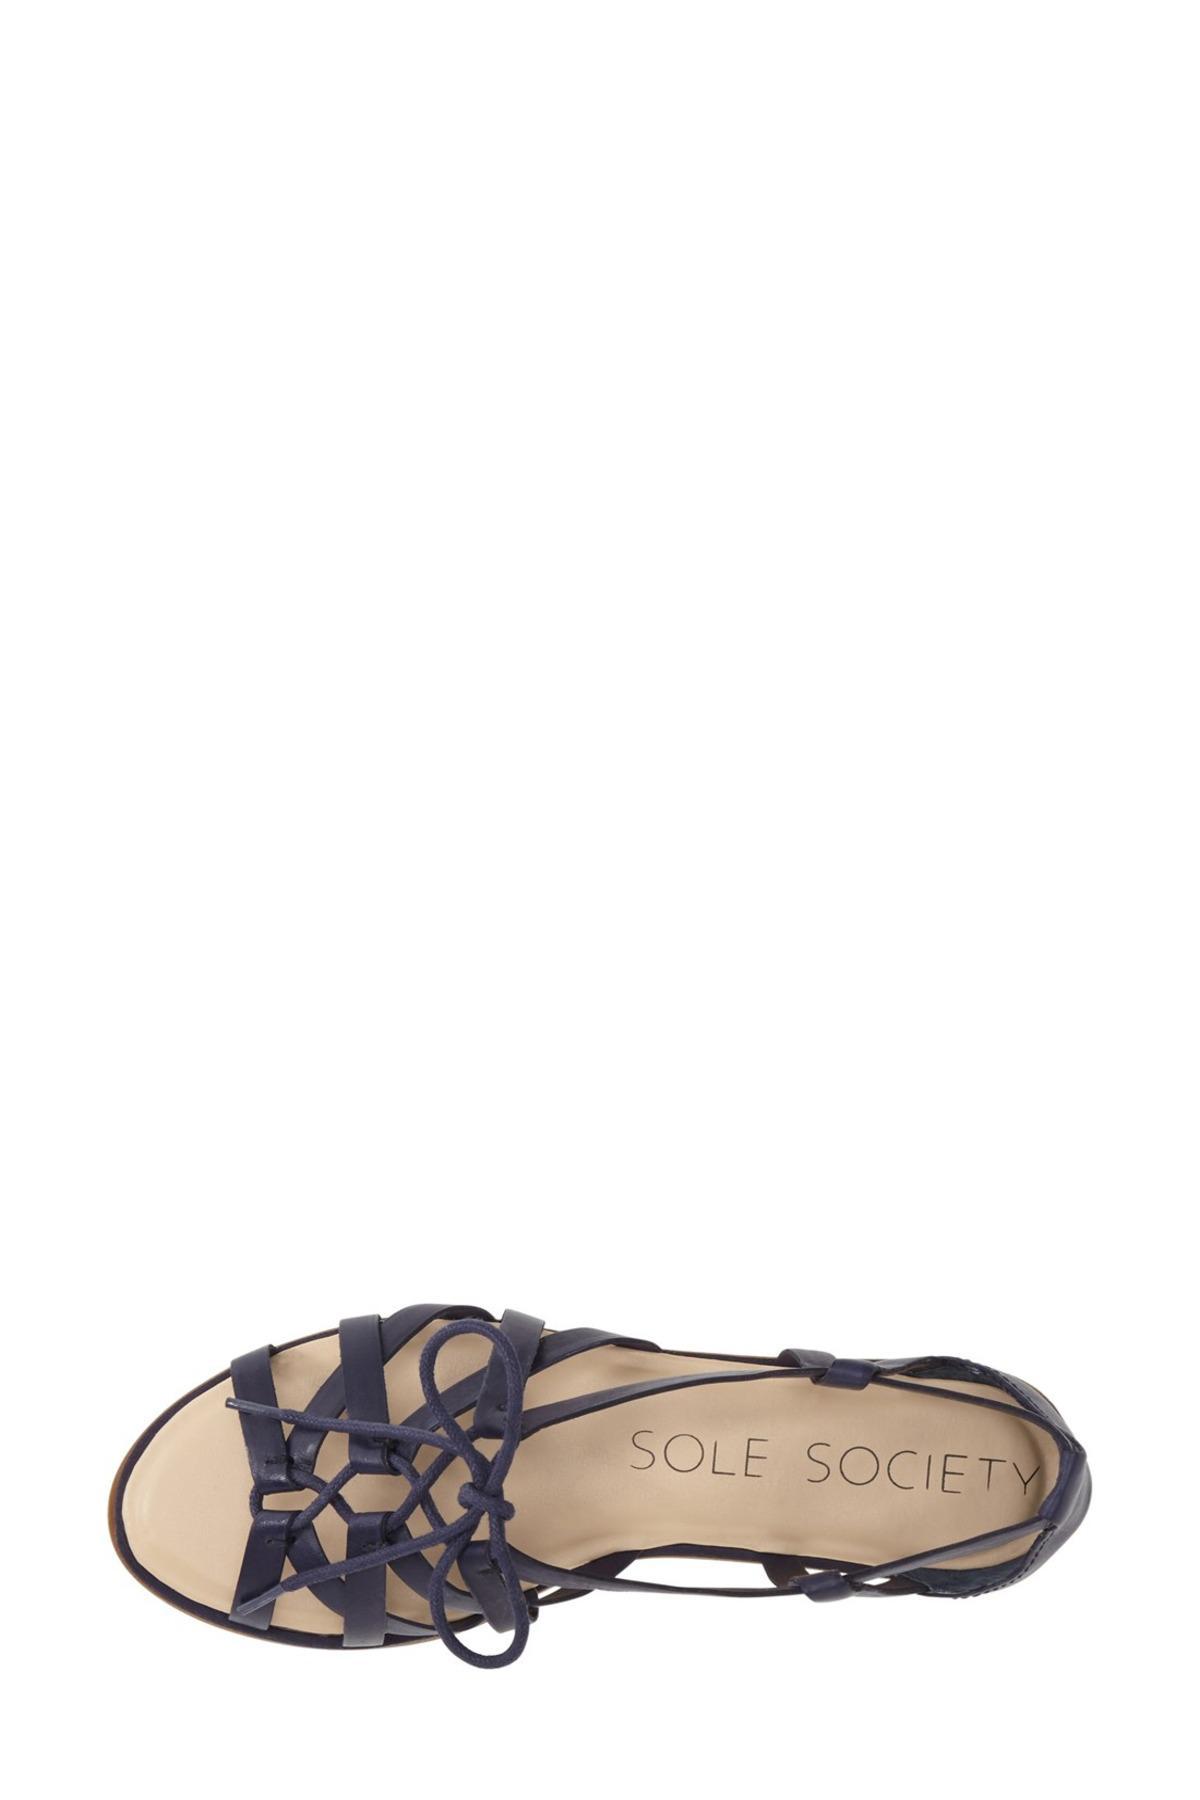 bcd98afb4322 Lyst - Sole Society  gillian  Gladiator Sandal (women) in Blue